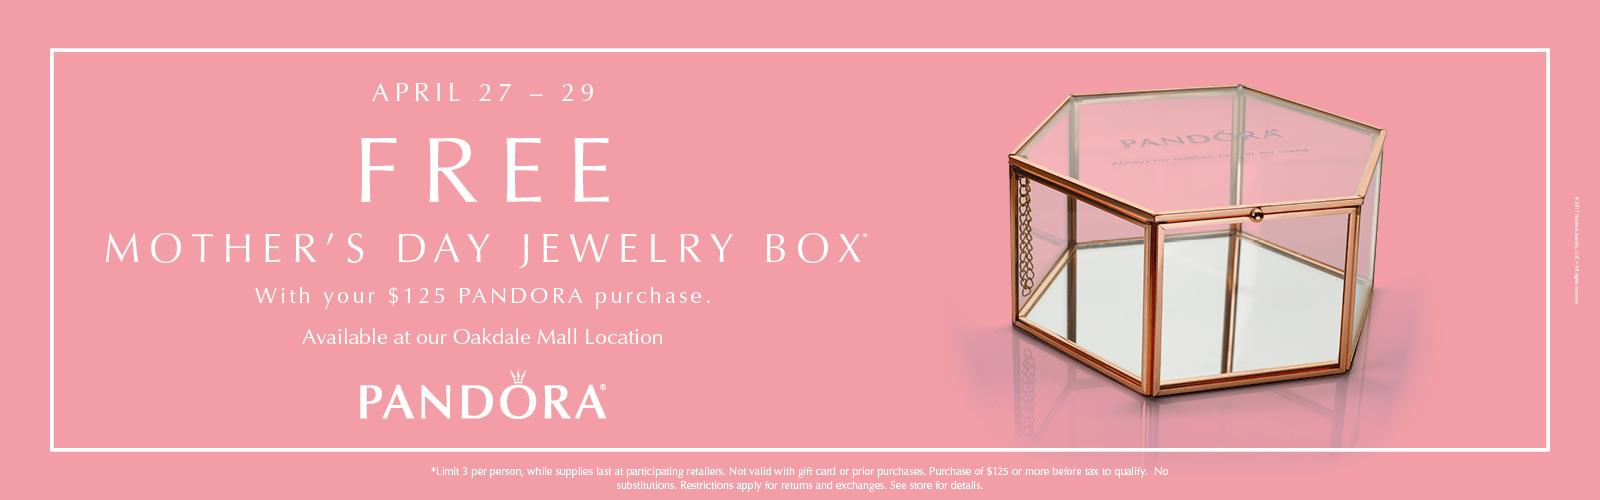 Pandora Free Jewelry Box!